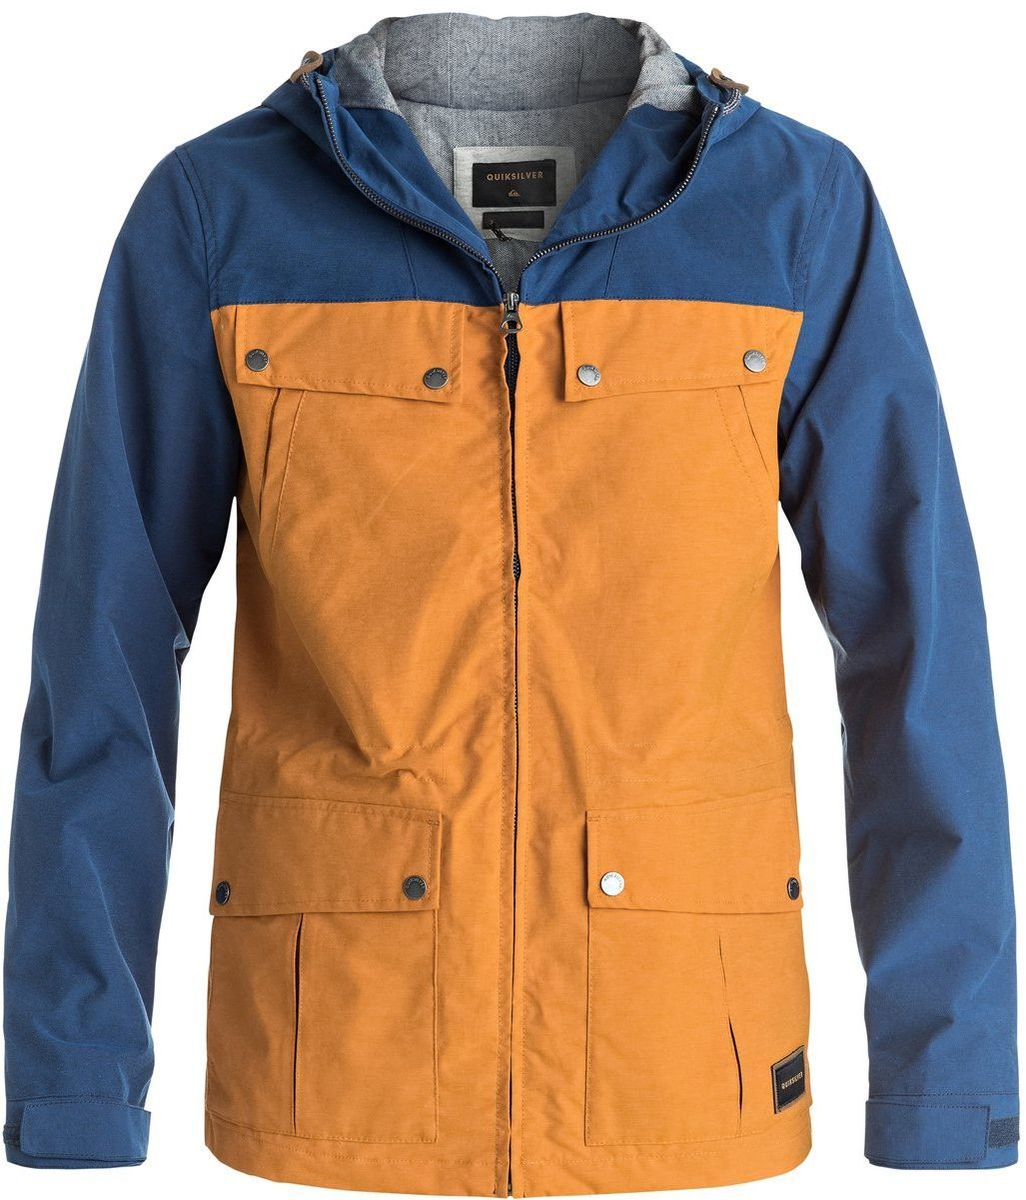 Куртка мужская Quiksilver, цвет: желтый, синий. EQYJK03292-NMVH. Размер M (48/50)